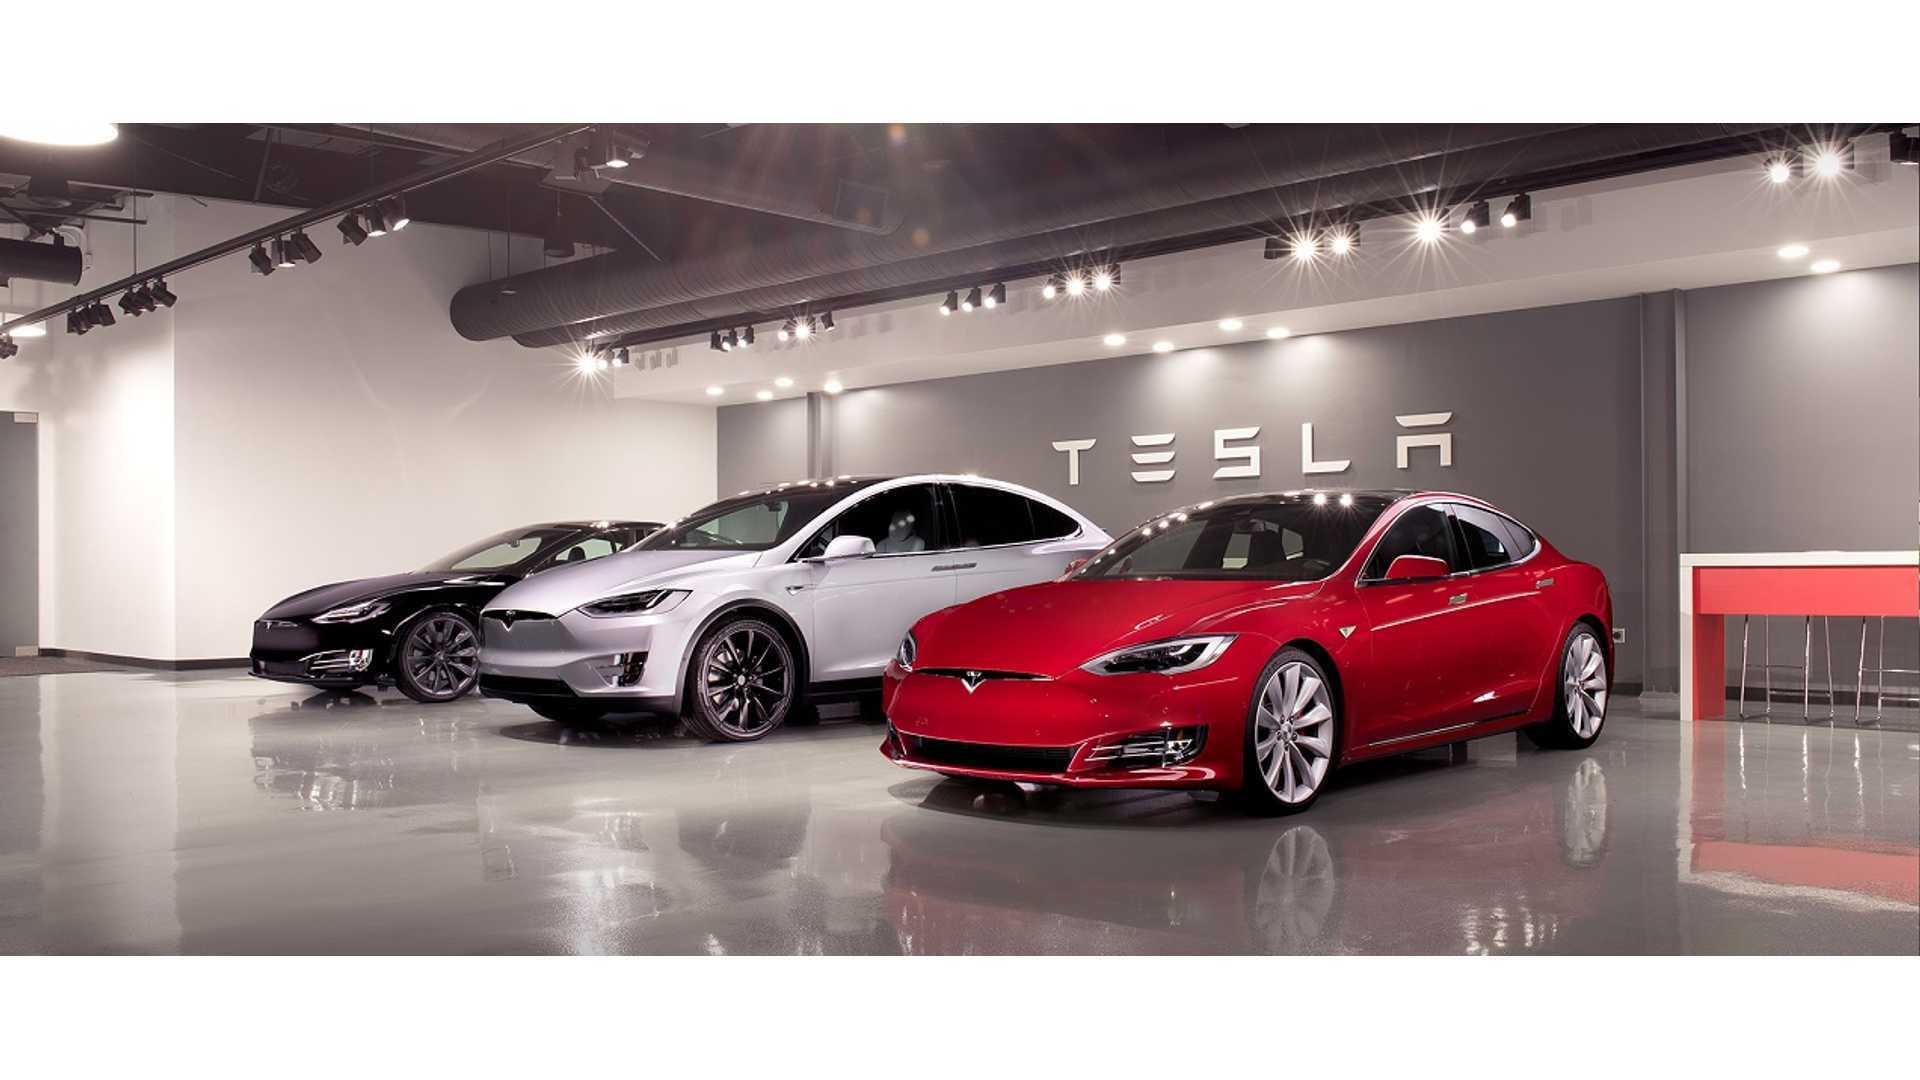 New Tesla Model S & X Software Updates: Suspension Improvements & More